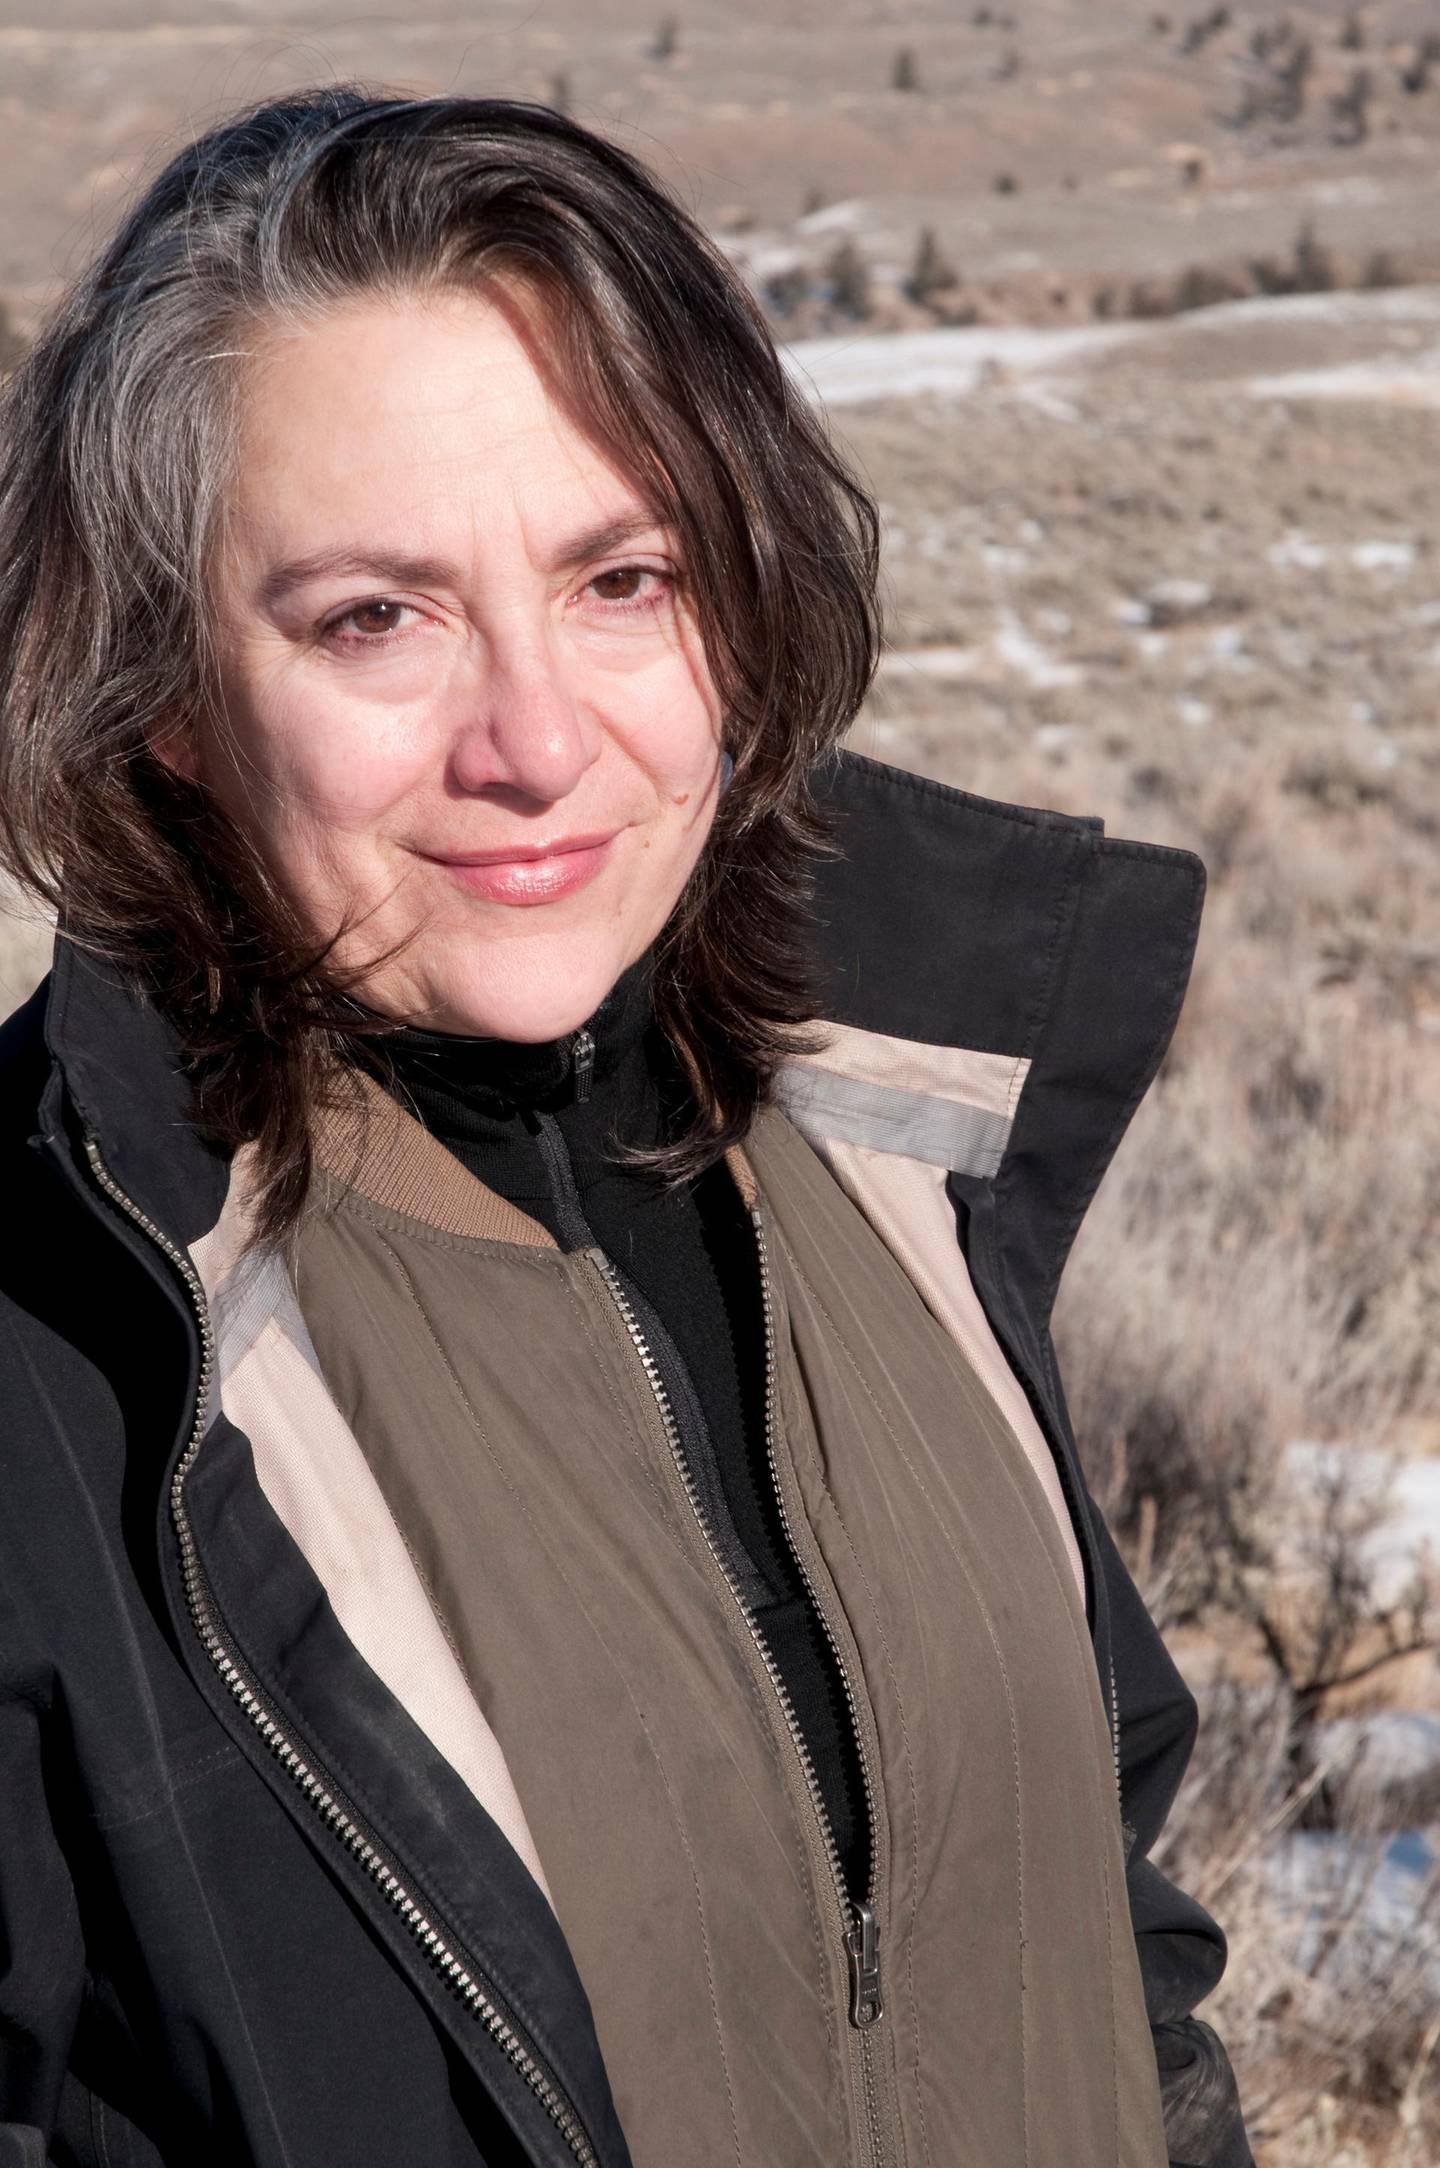 Carol Dysinger in Yellowstone National Park.